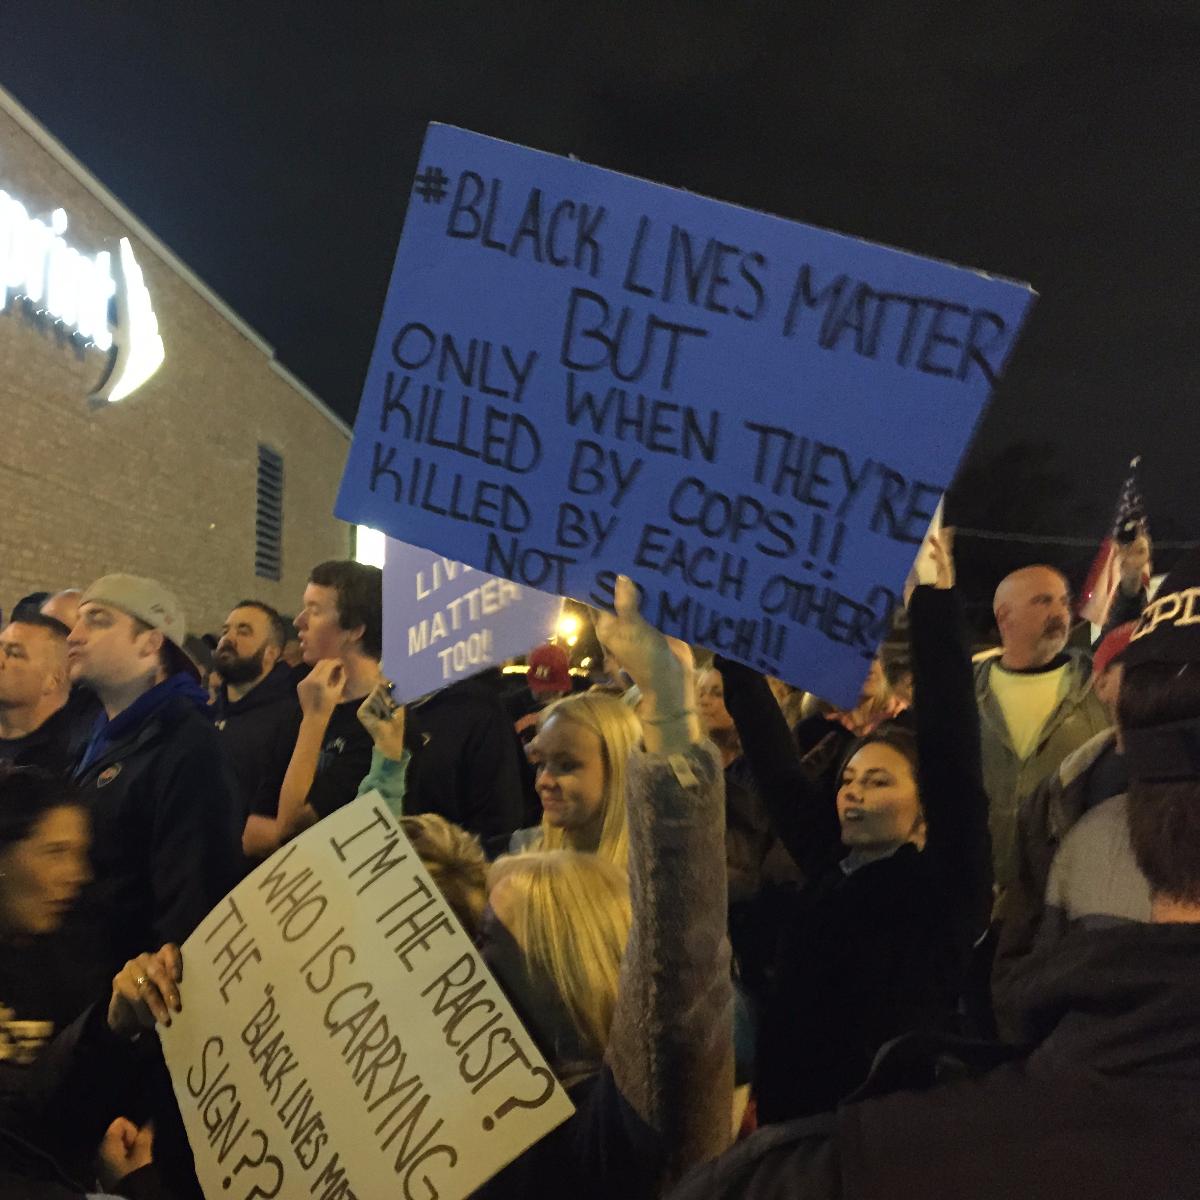 Blue Lives Matter protestors hold up signs in Mount Greenwood earlier this month. (Sarah Karp/WBEZ)